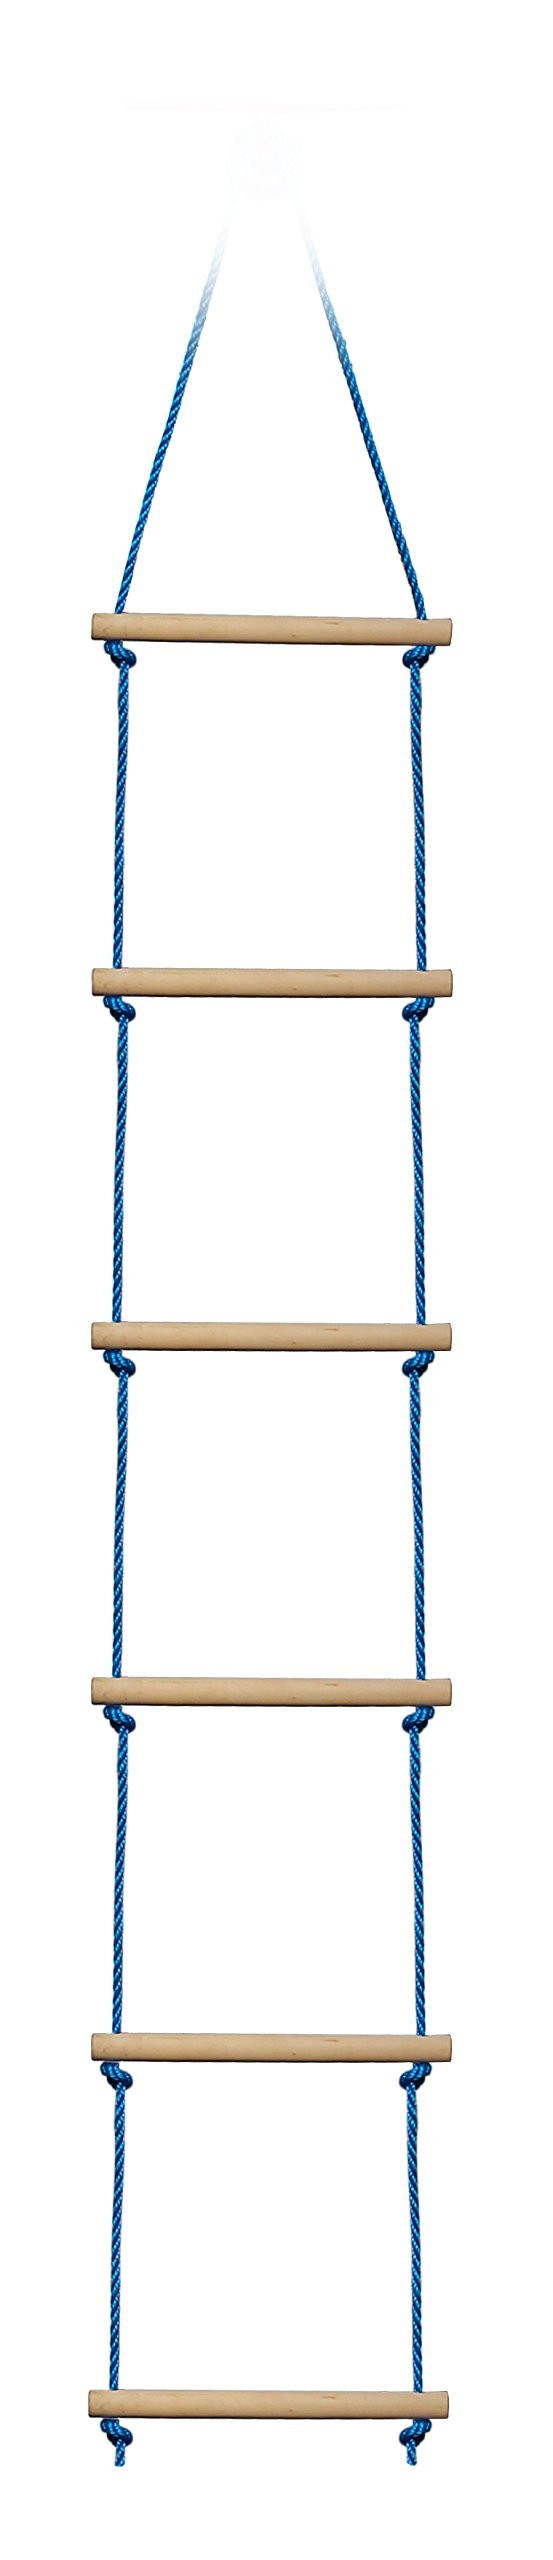 Slackers NinjaLine Rope Ladder, Blue, 8' by Slackers (Image #2)